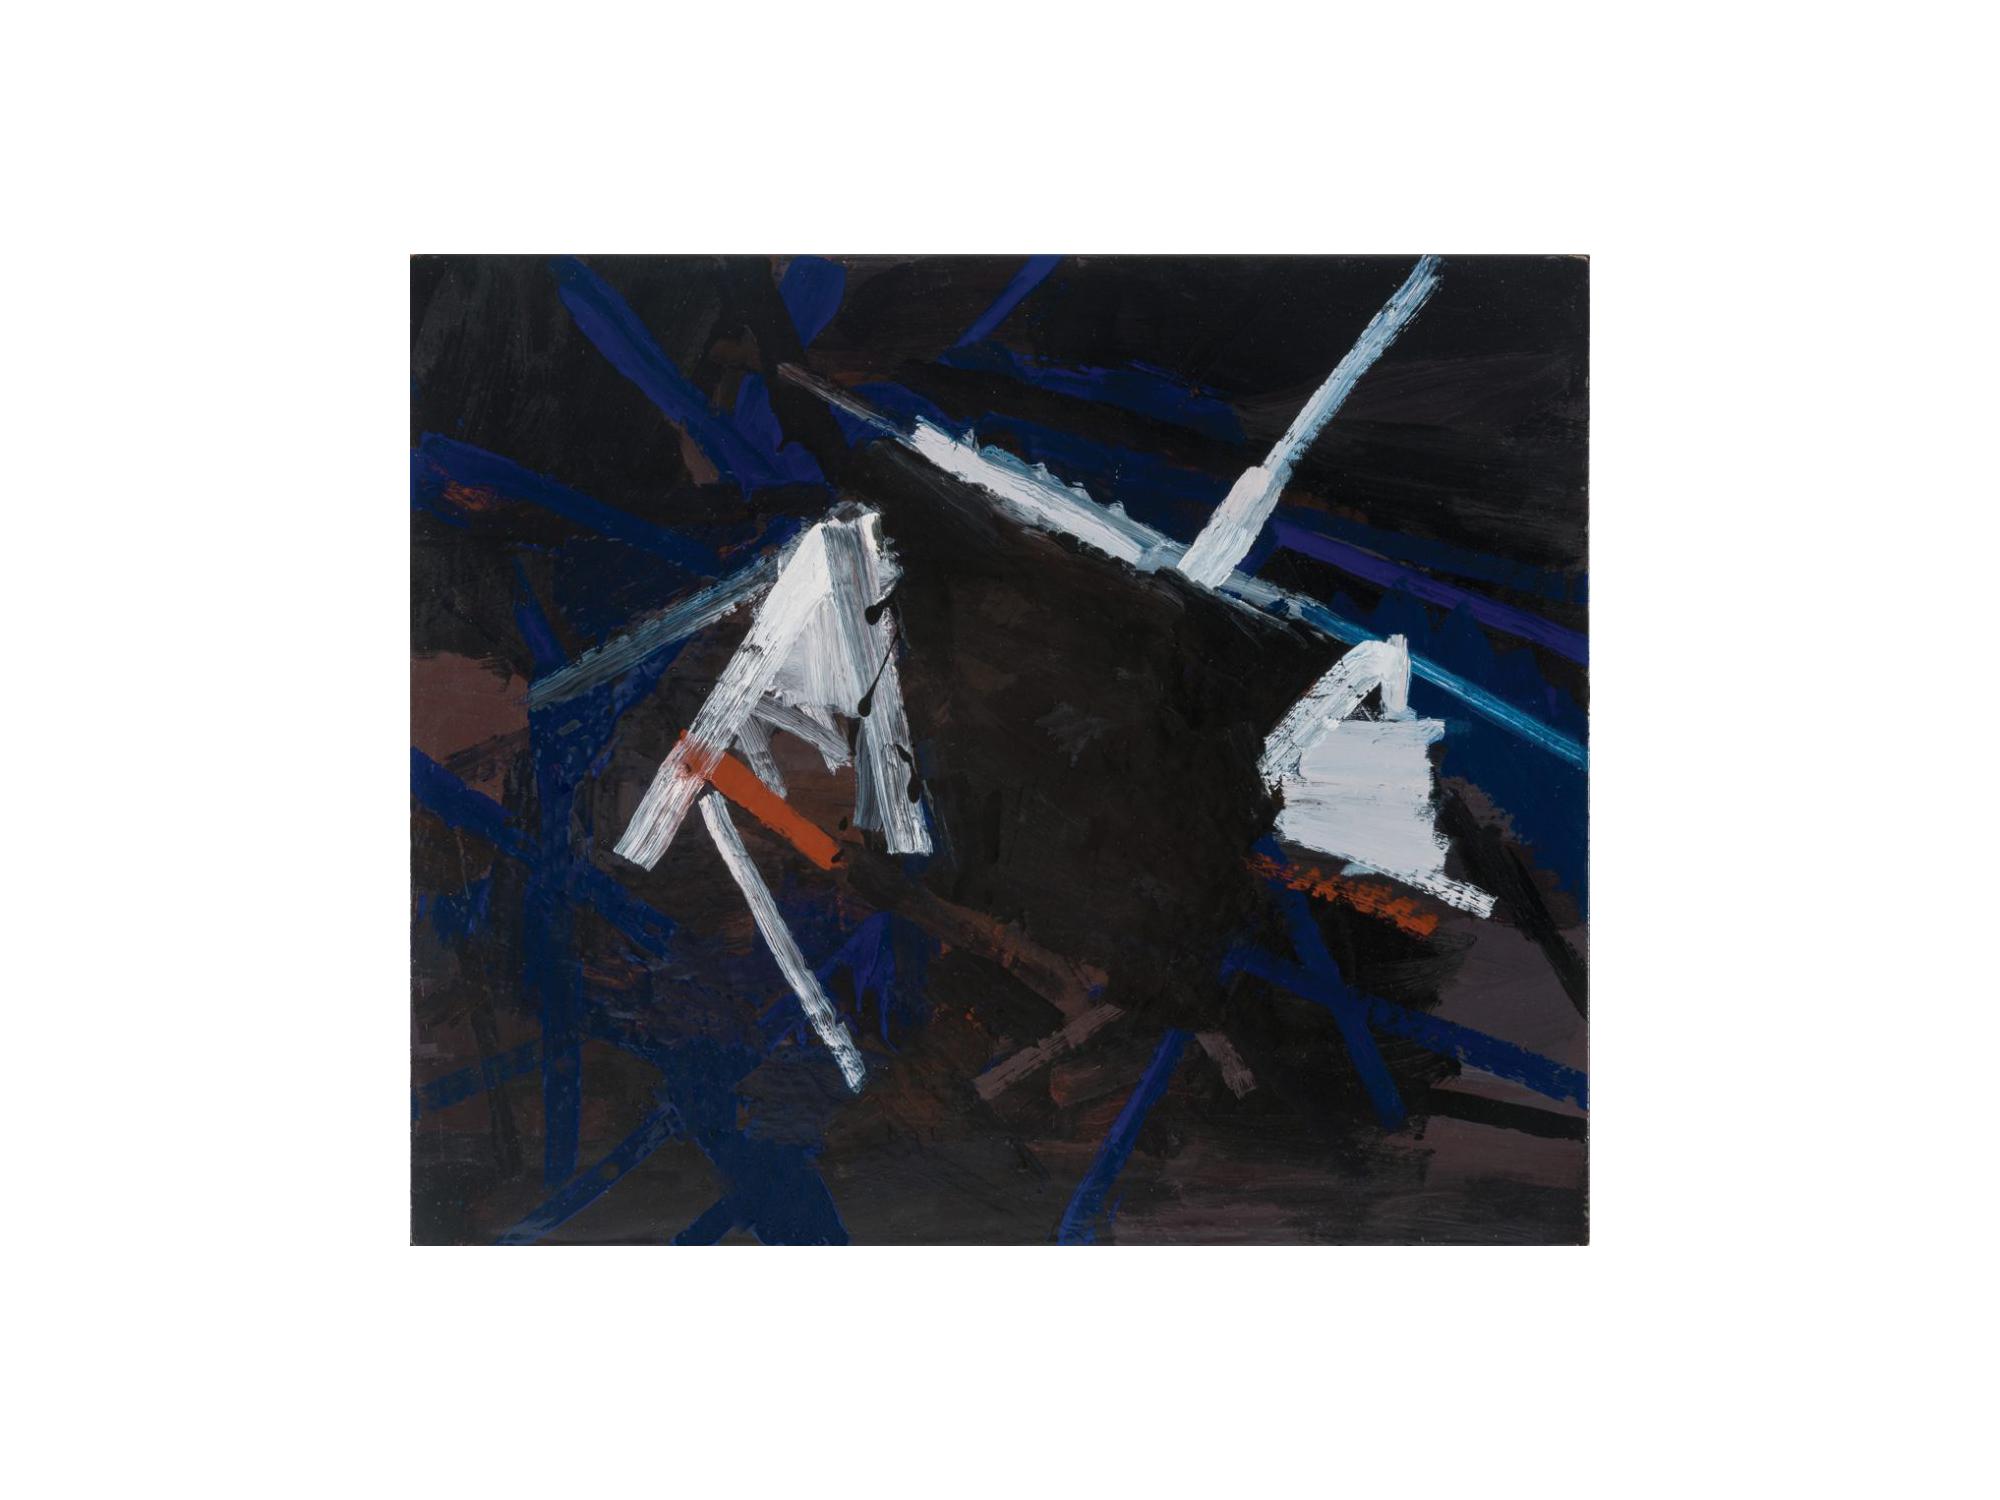 James Clayden   Tunnel , 2016 enamel on board 38 x 45cm   ARTIST BIO